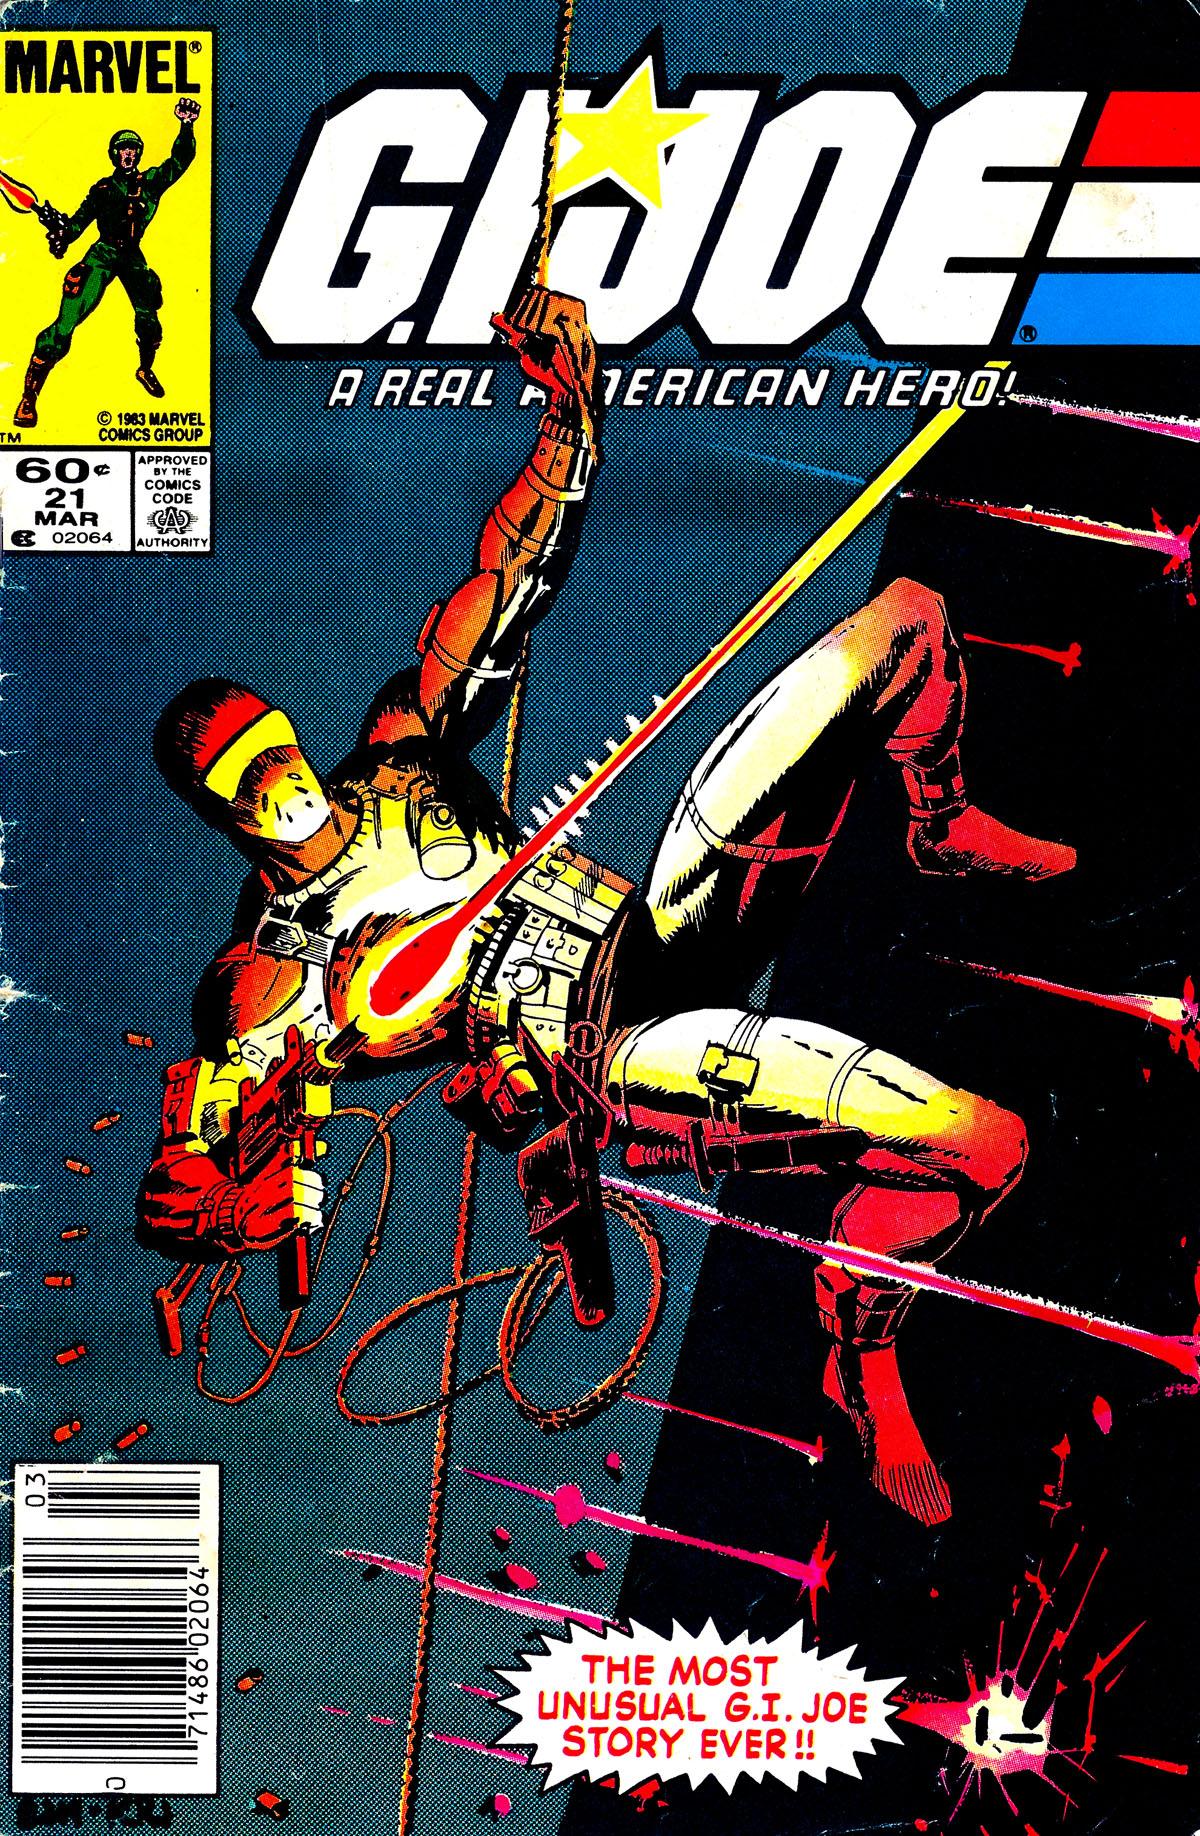 G.I. Joe: A Real American Hero 21 Page 1